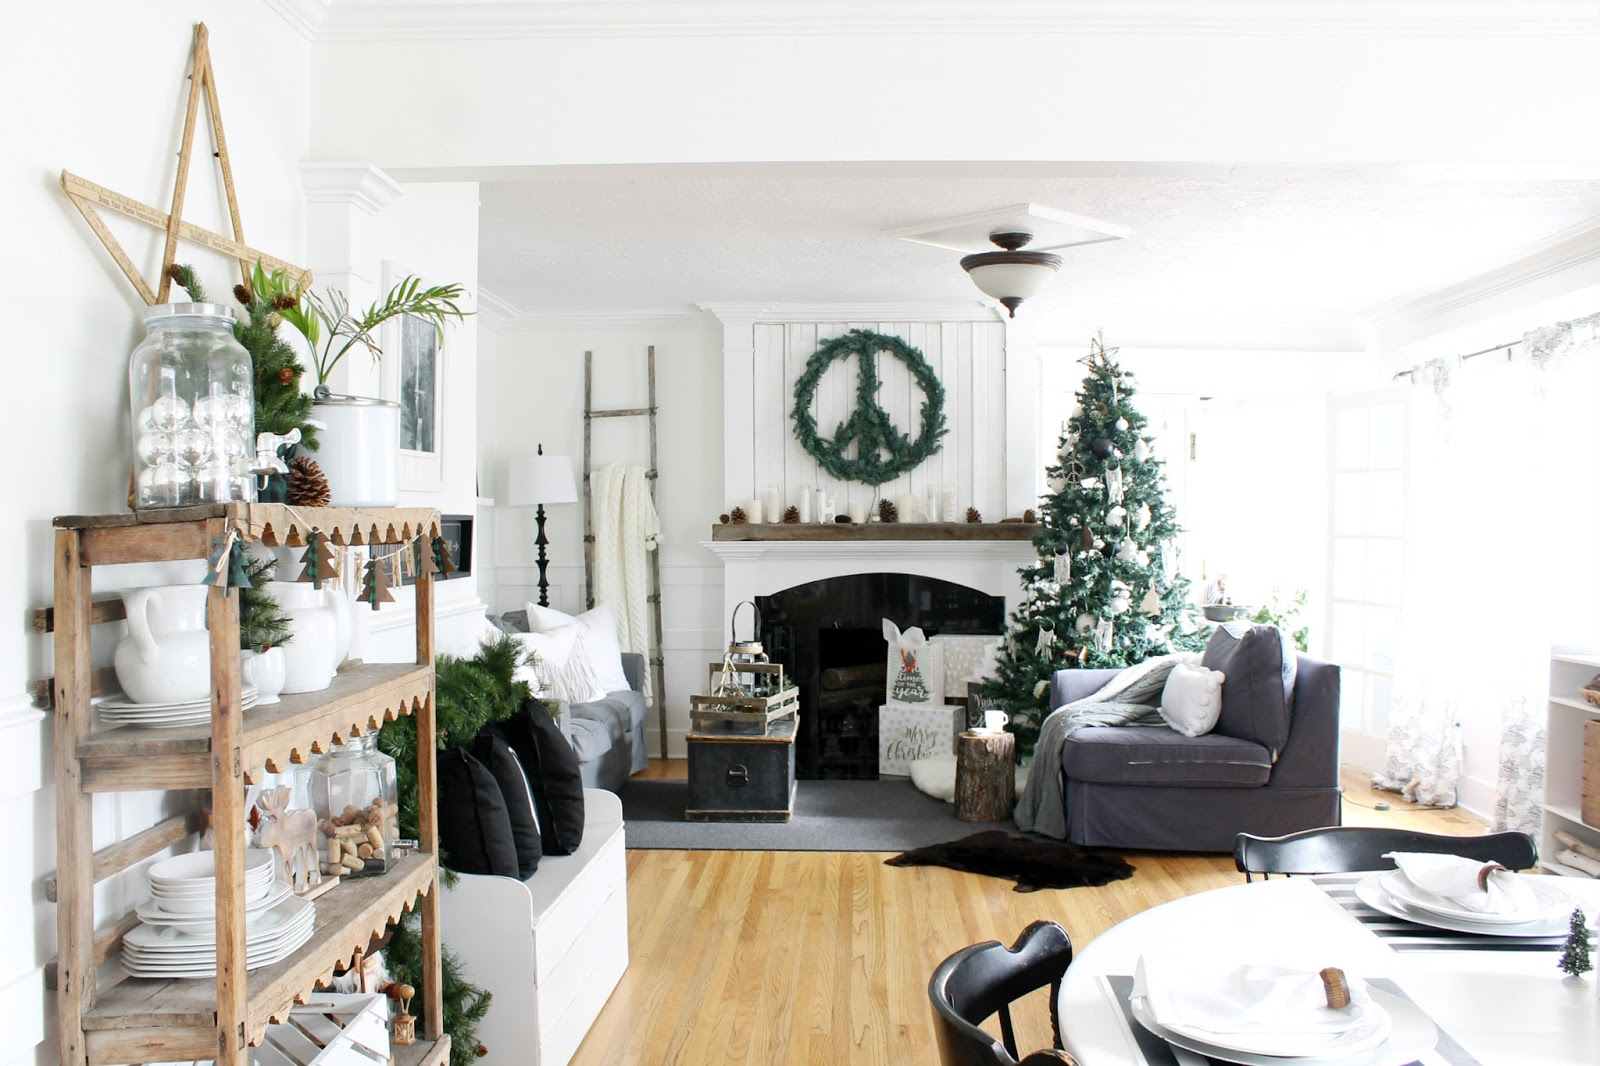 Cozy Christmas Home Tour 2017 - The Wicker House